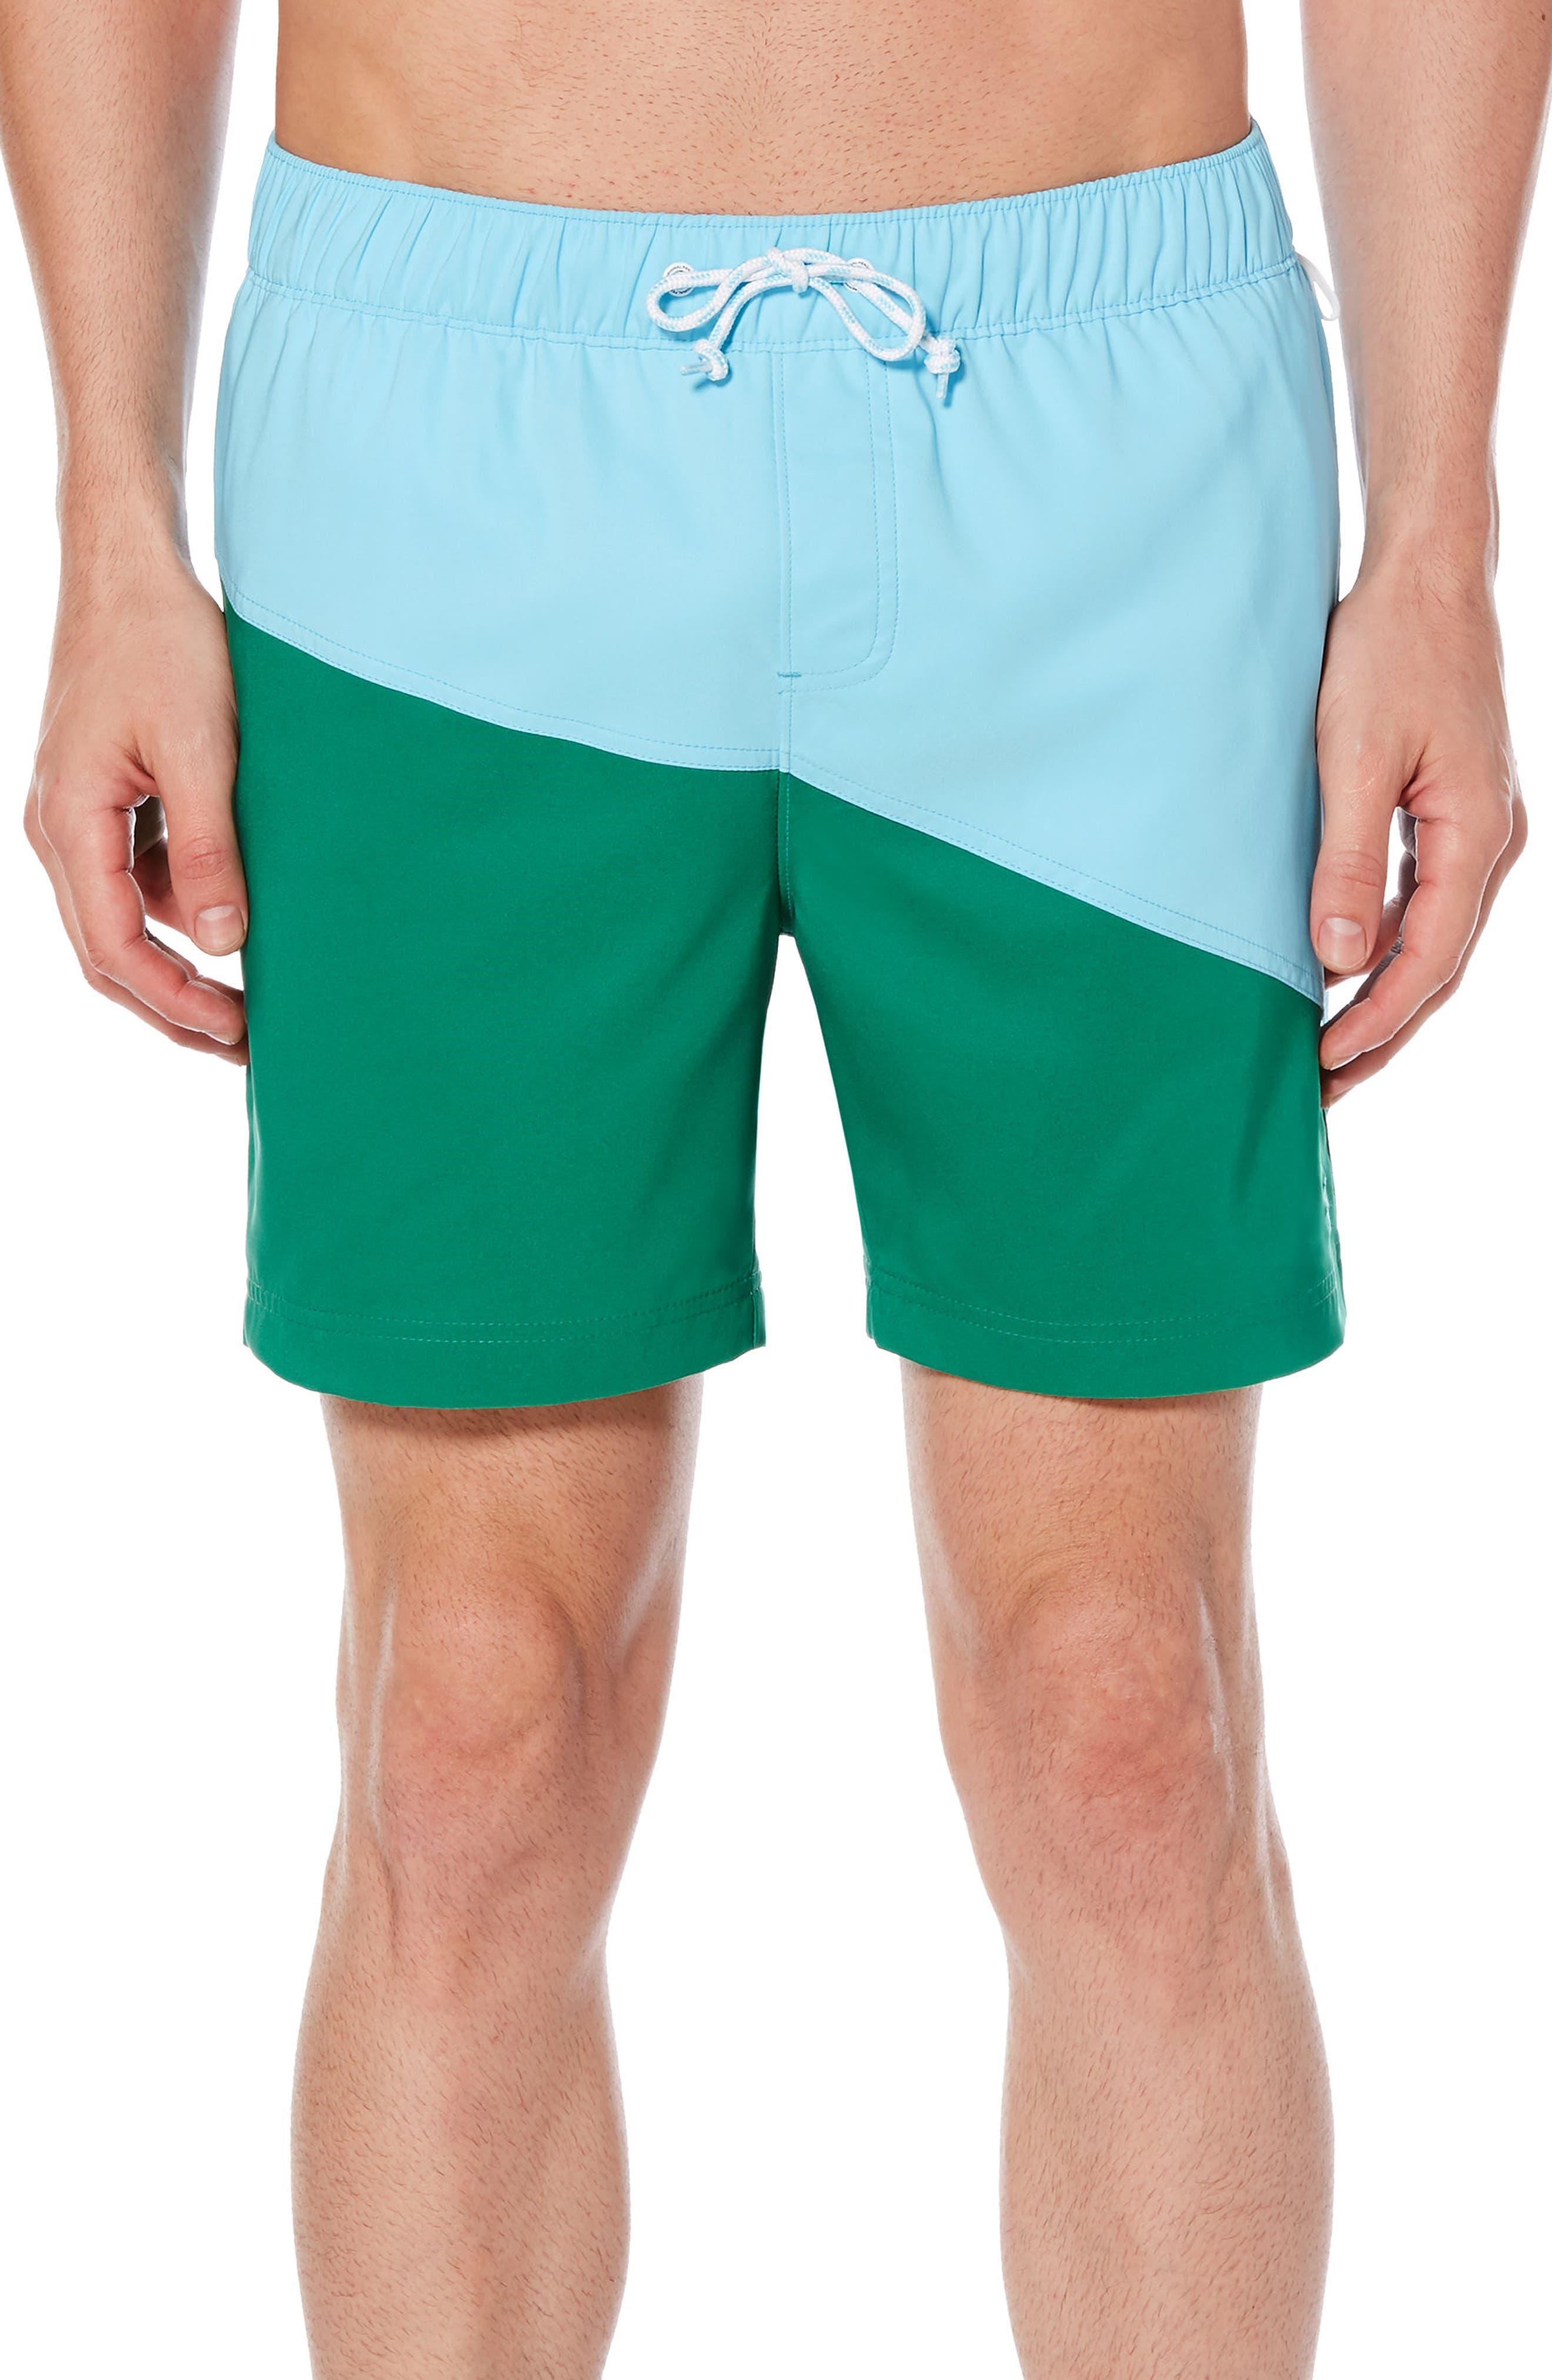 Colorblock Swim Trunks,                         Main,                         color, Blue Topaz